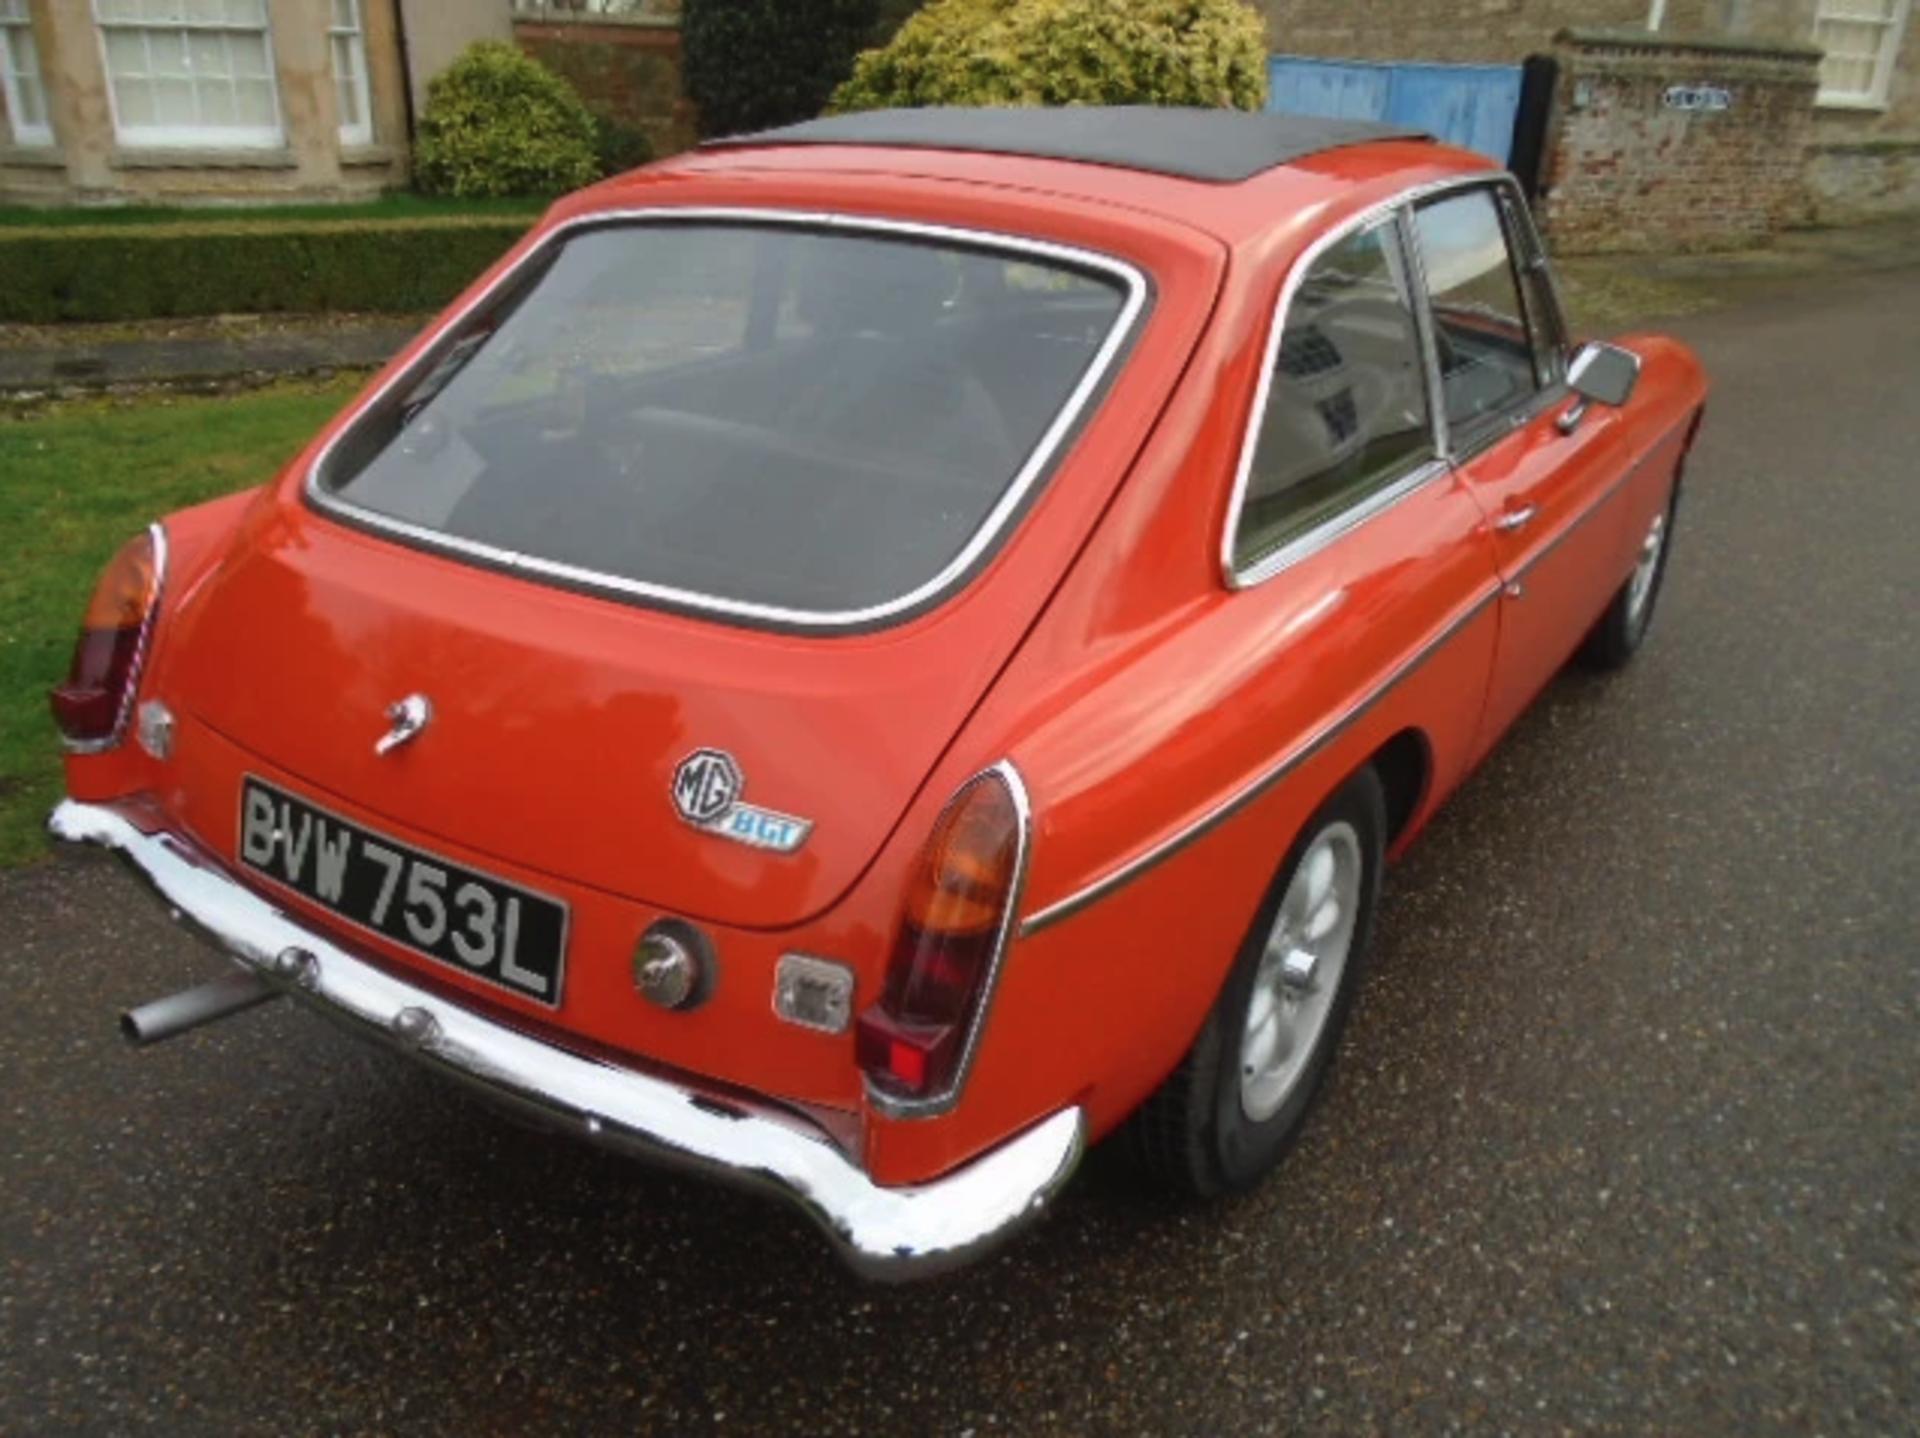 1973 MG B GT - Image 3 of 6